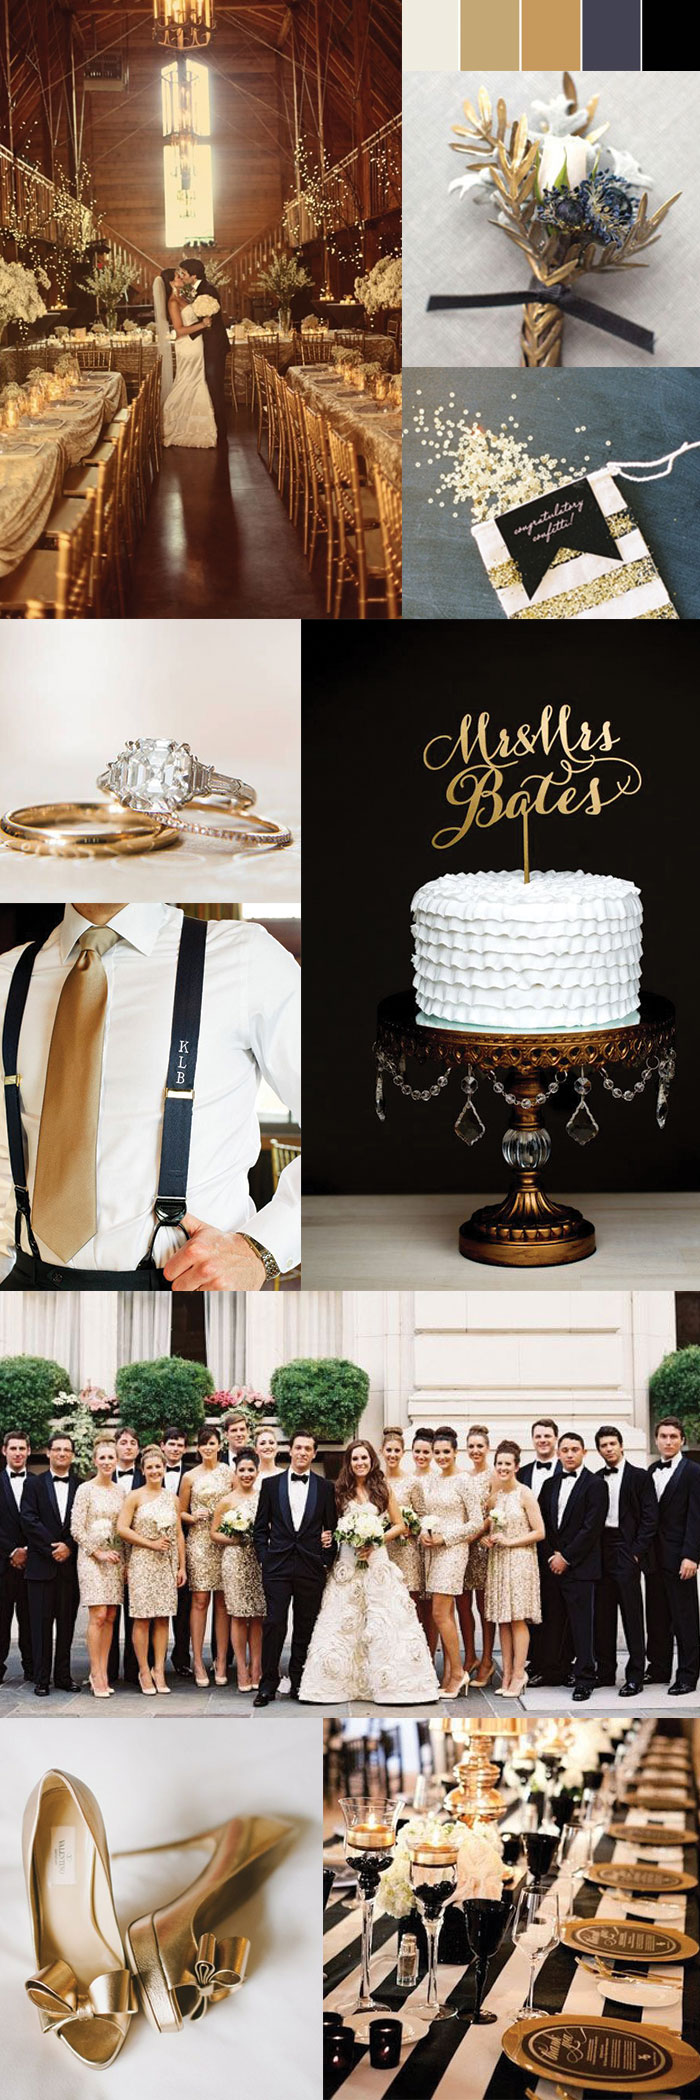 Black And White Wedding Decoration Ideas